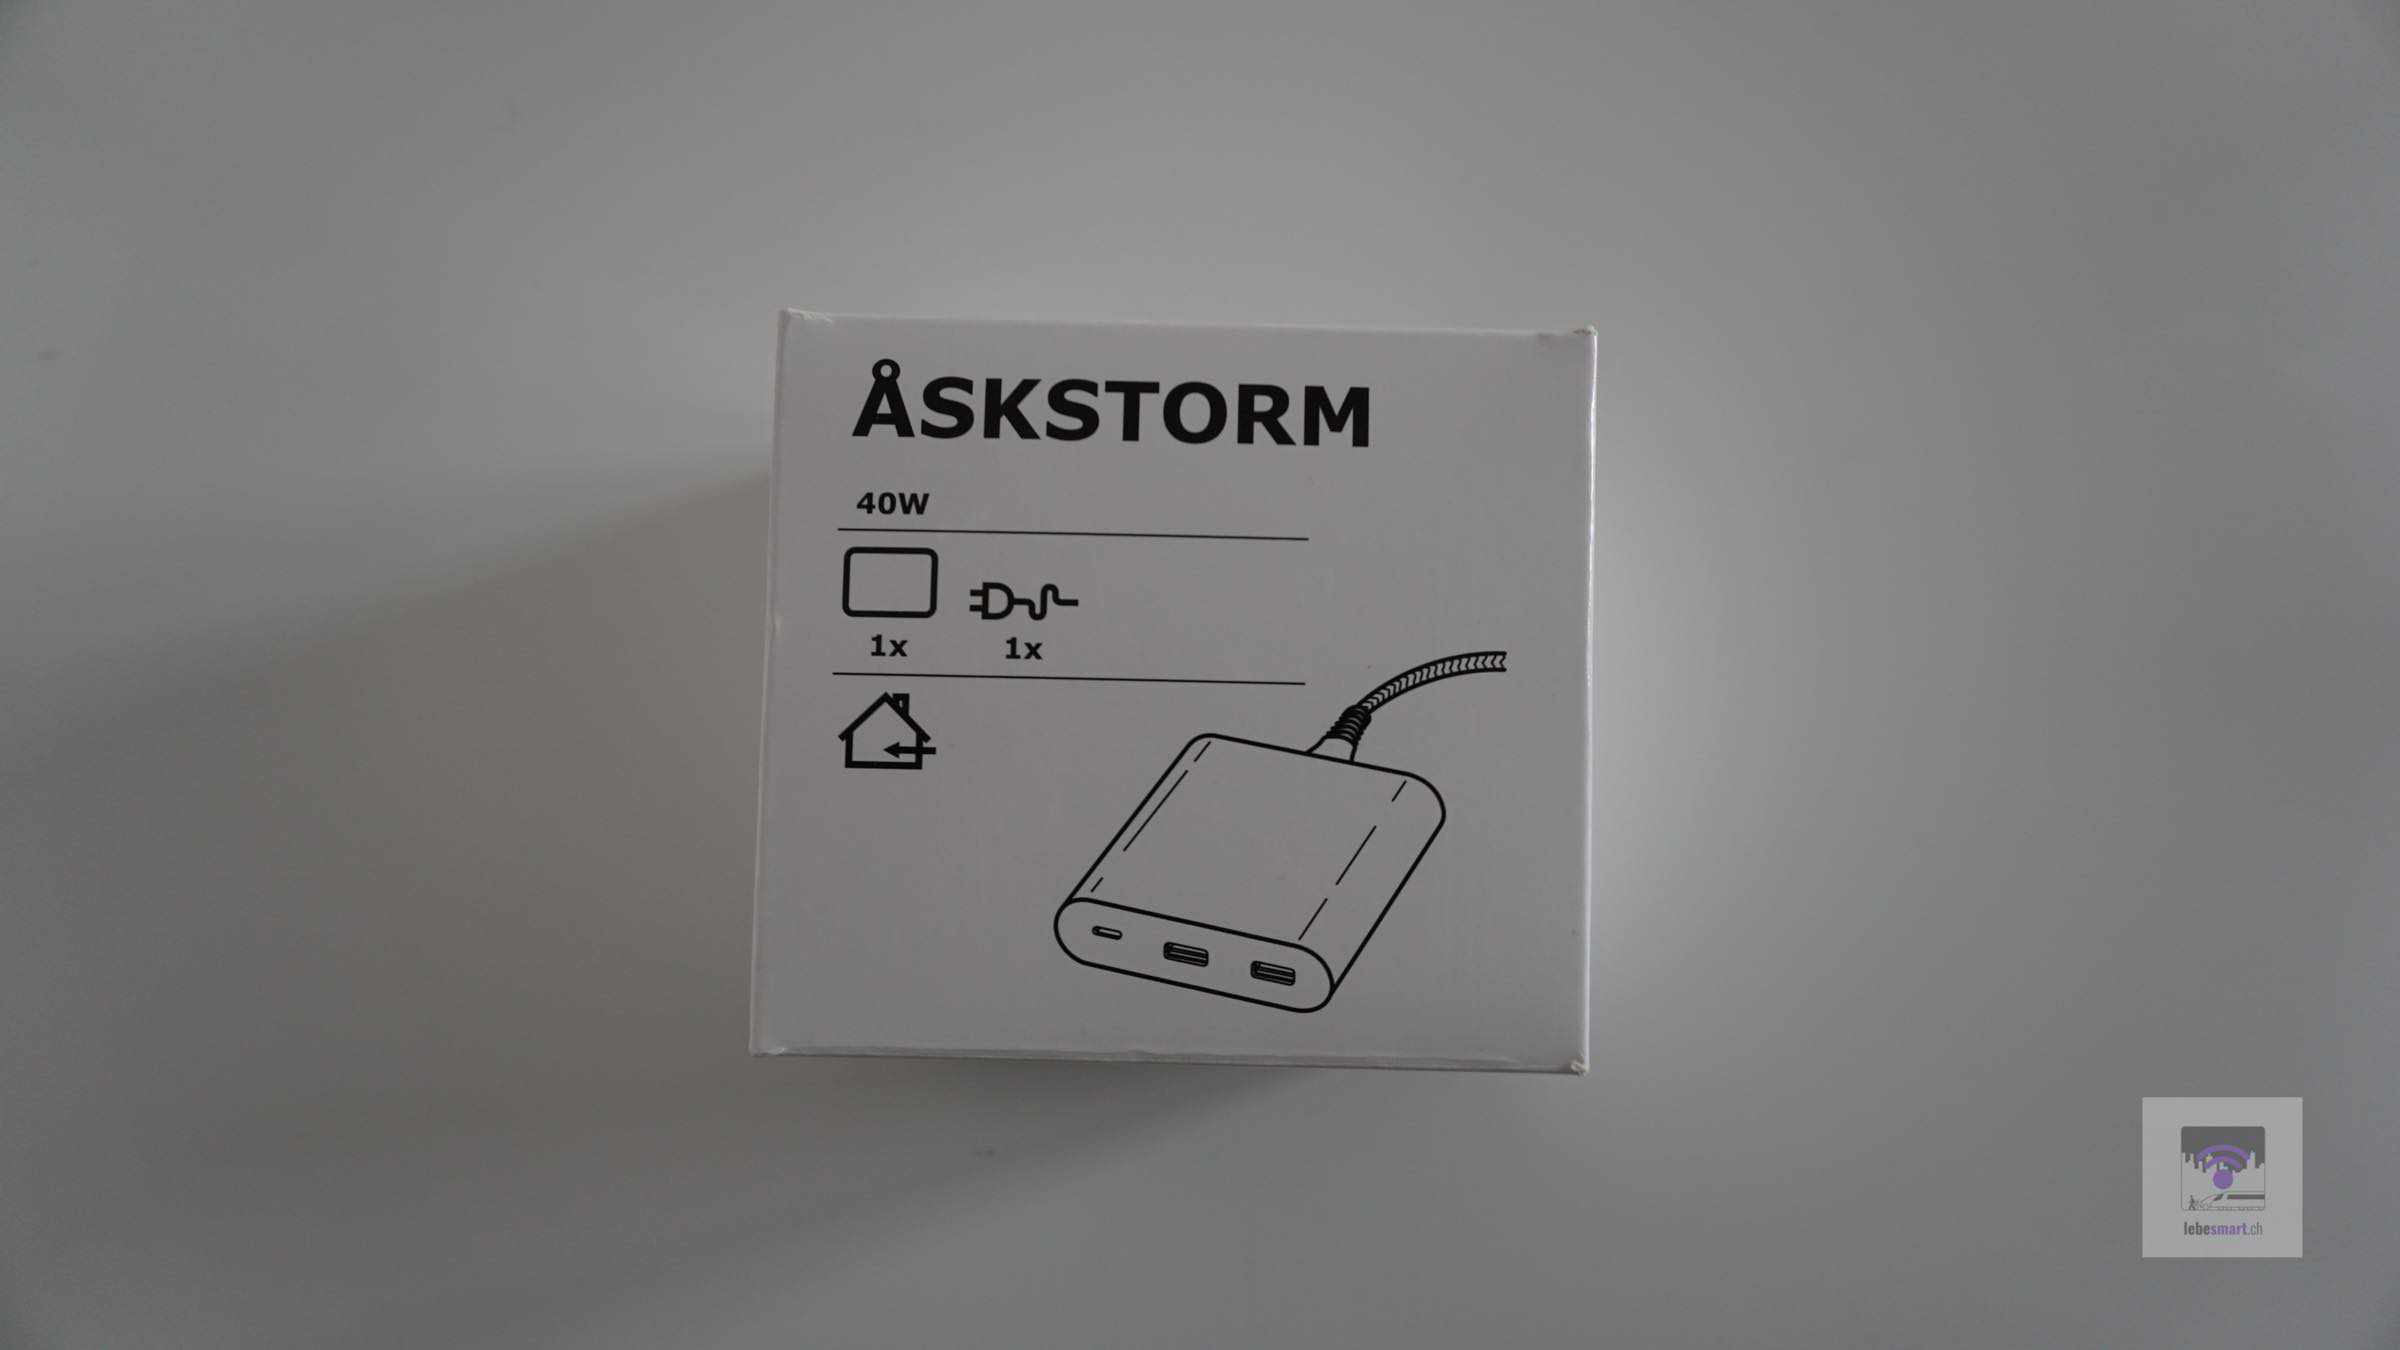 IKEA ÅSKSTORM – Ladegerät in günstig vorgestellt